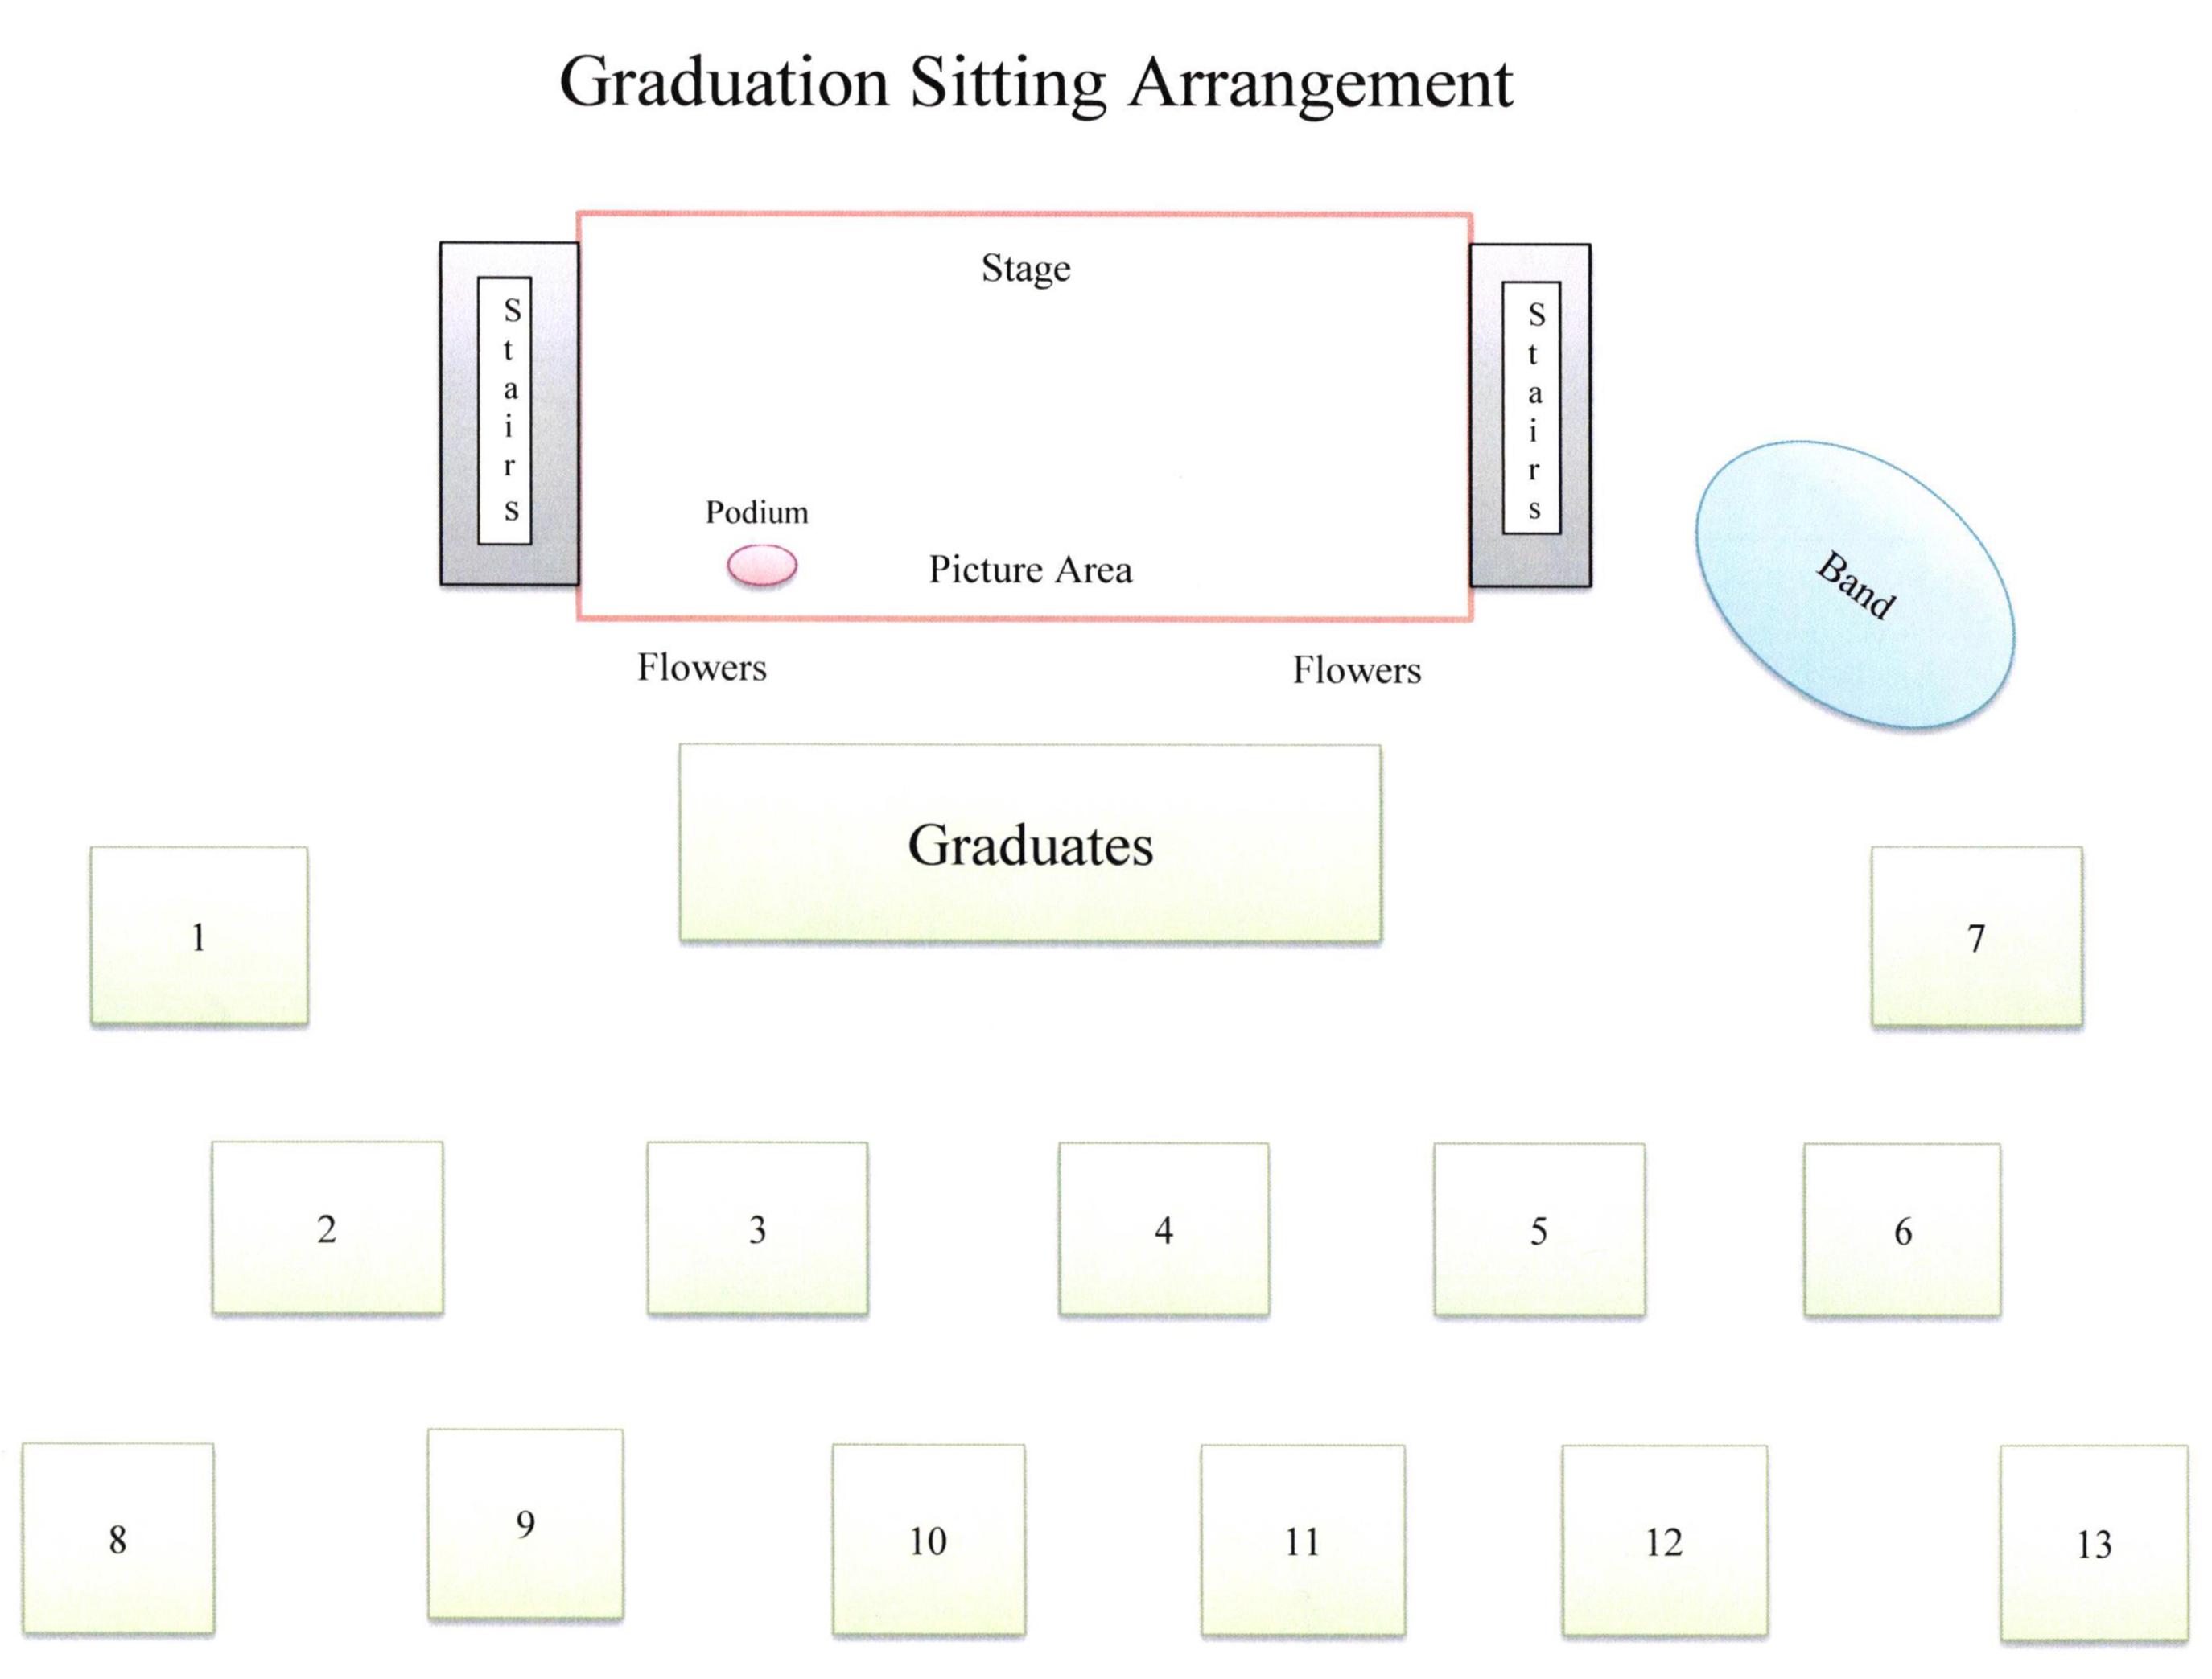 Graduation Seating Arrangement for June 12